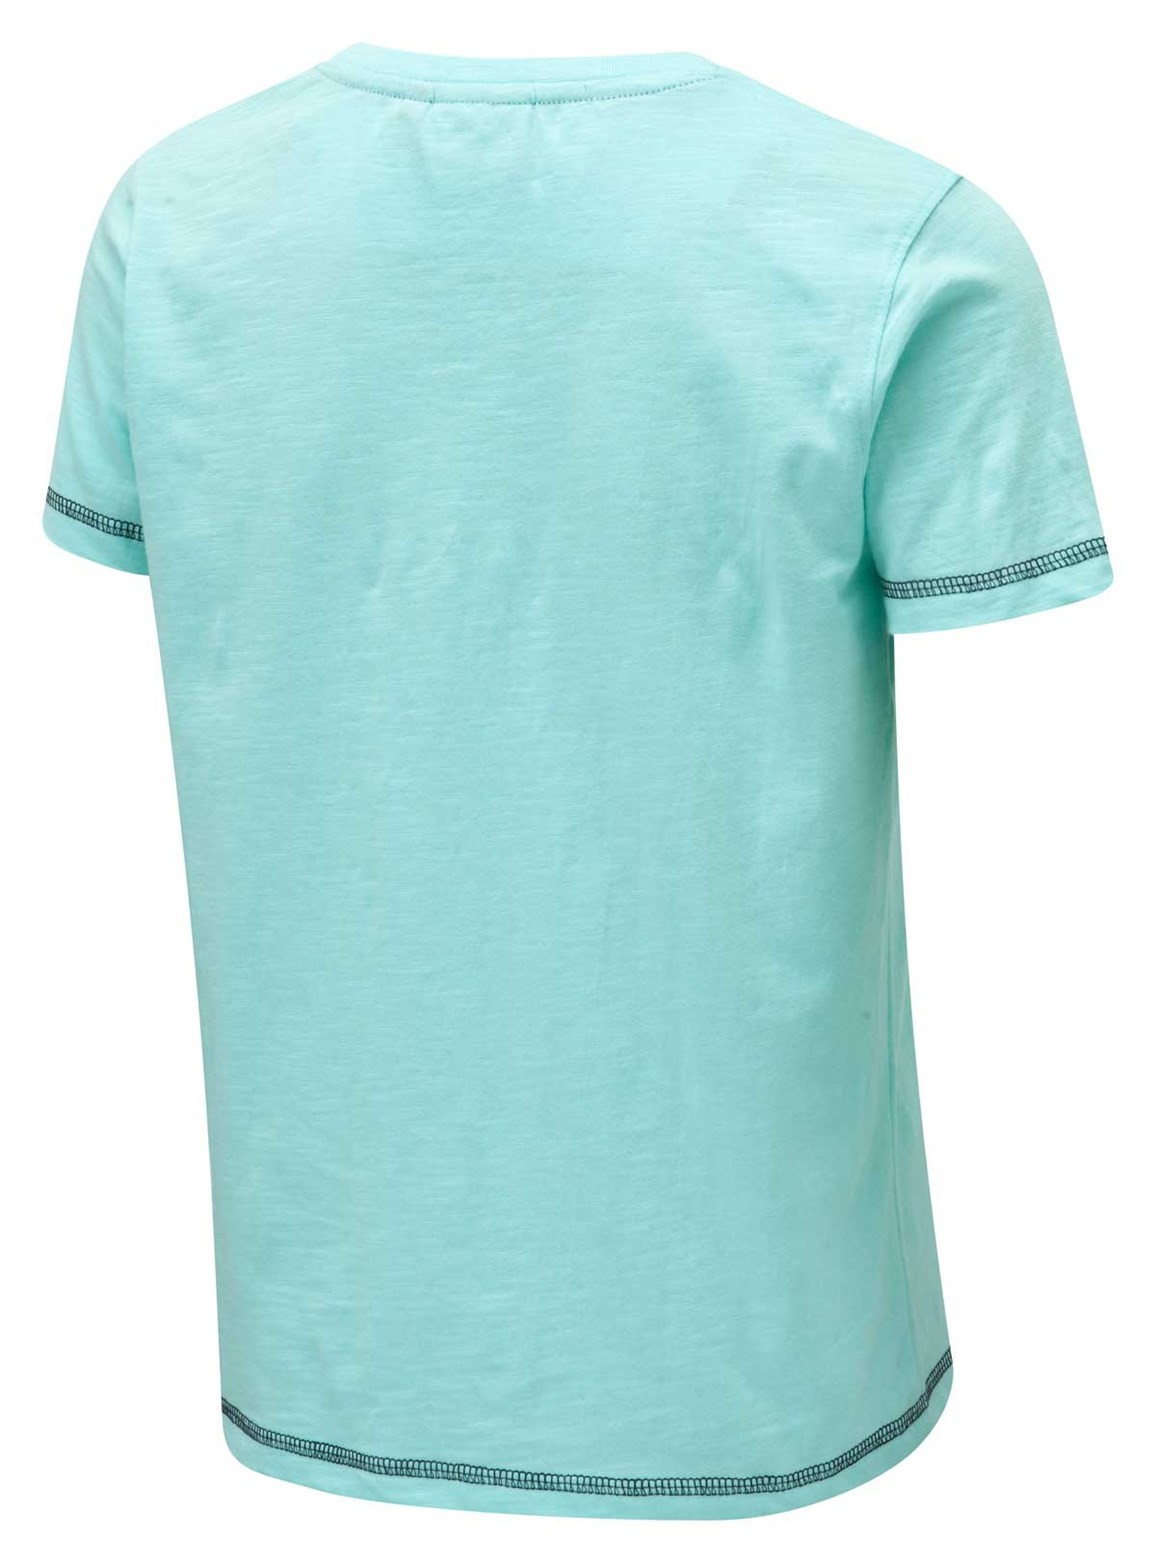 Reef Graphic Print T Shirt Aqua